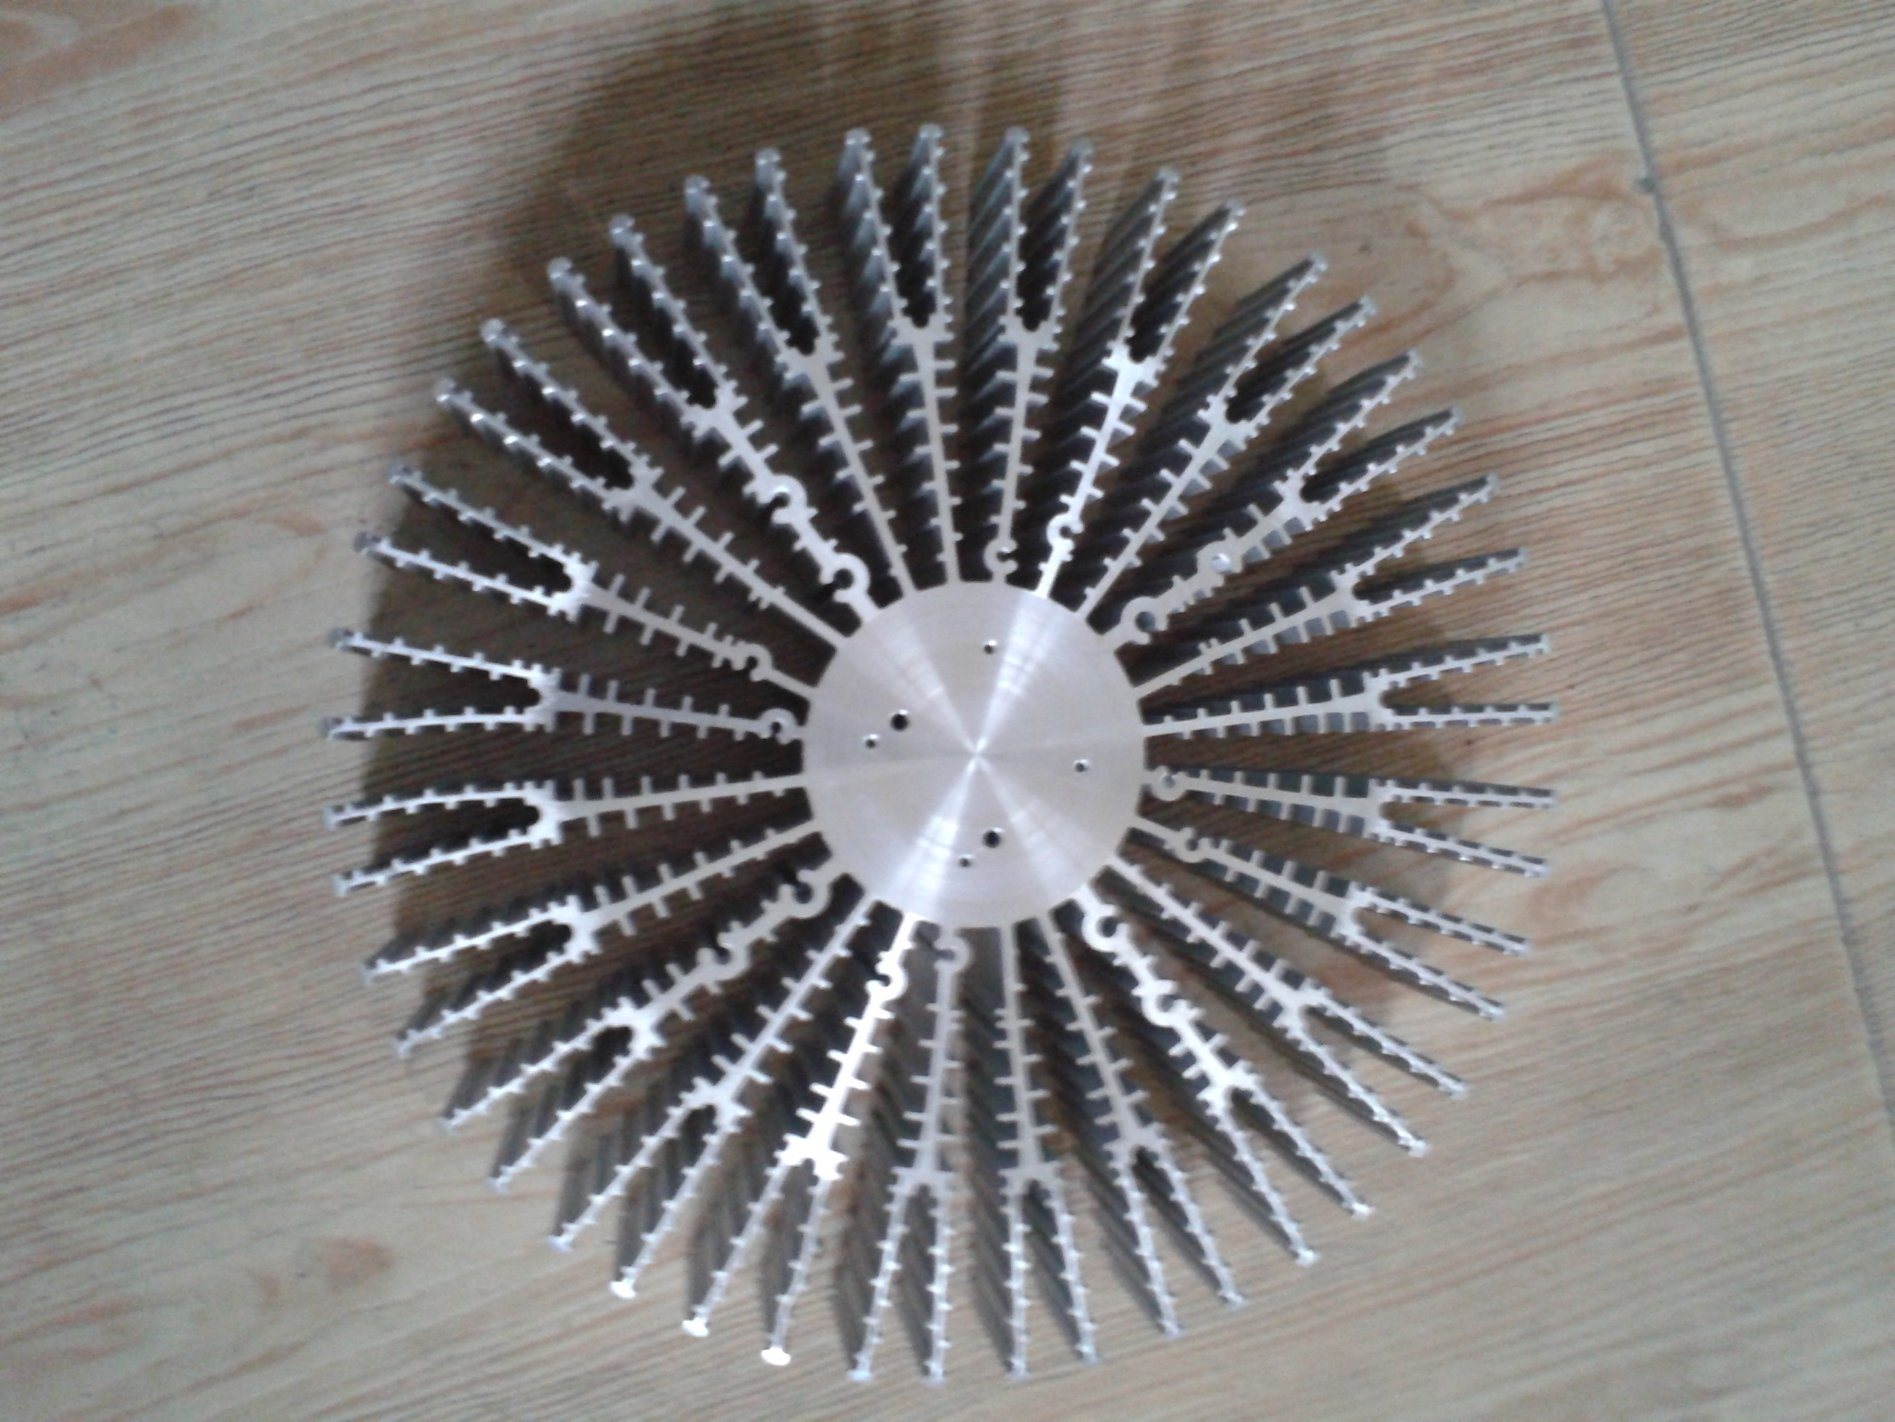 Aluminium Heat Sink for High-Volume Lamp